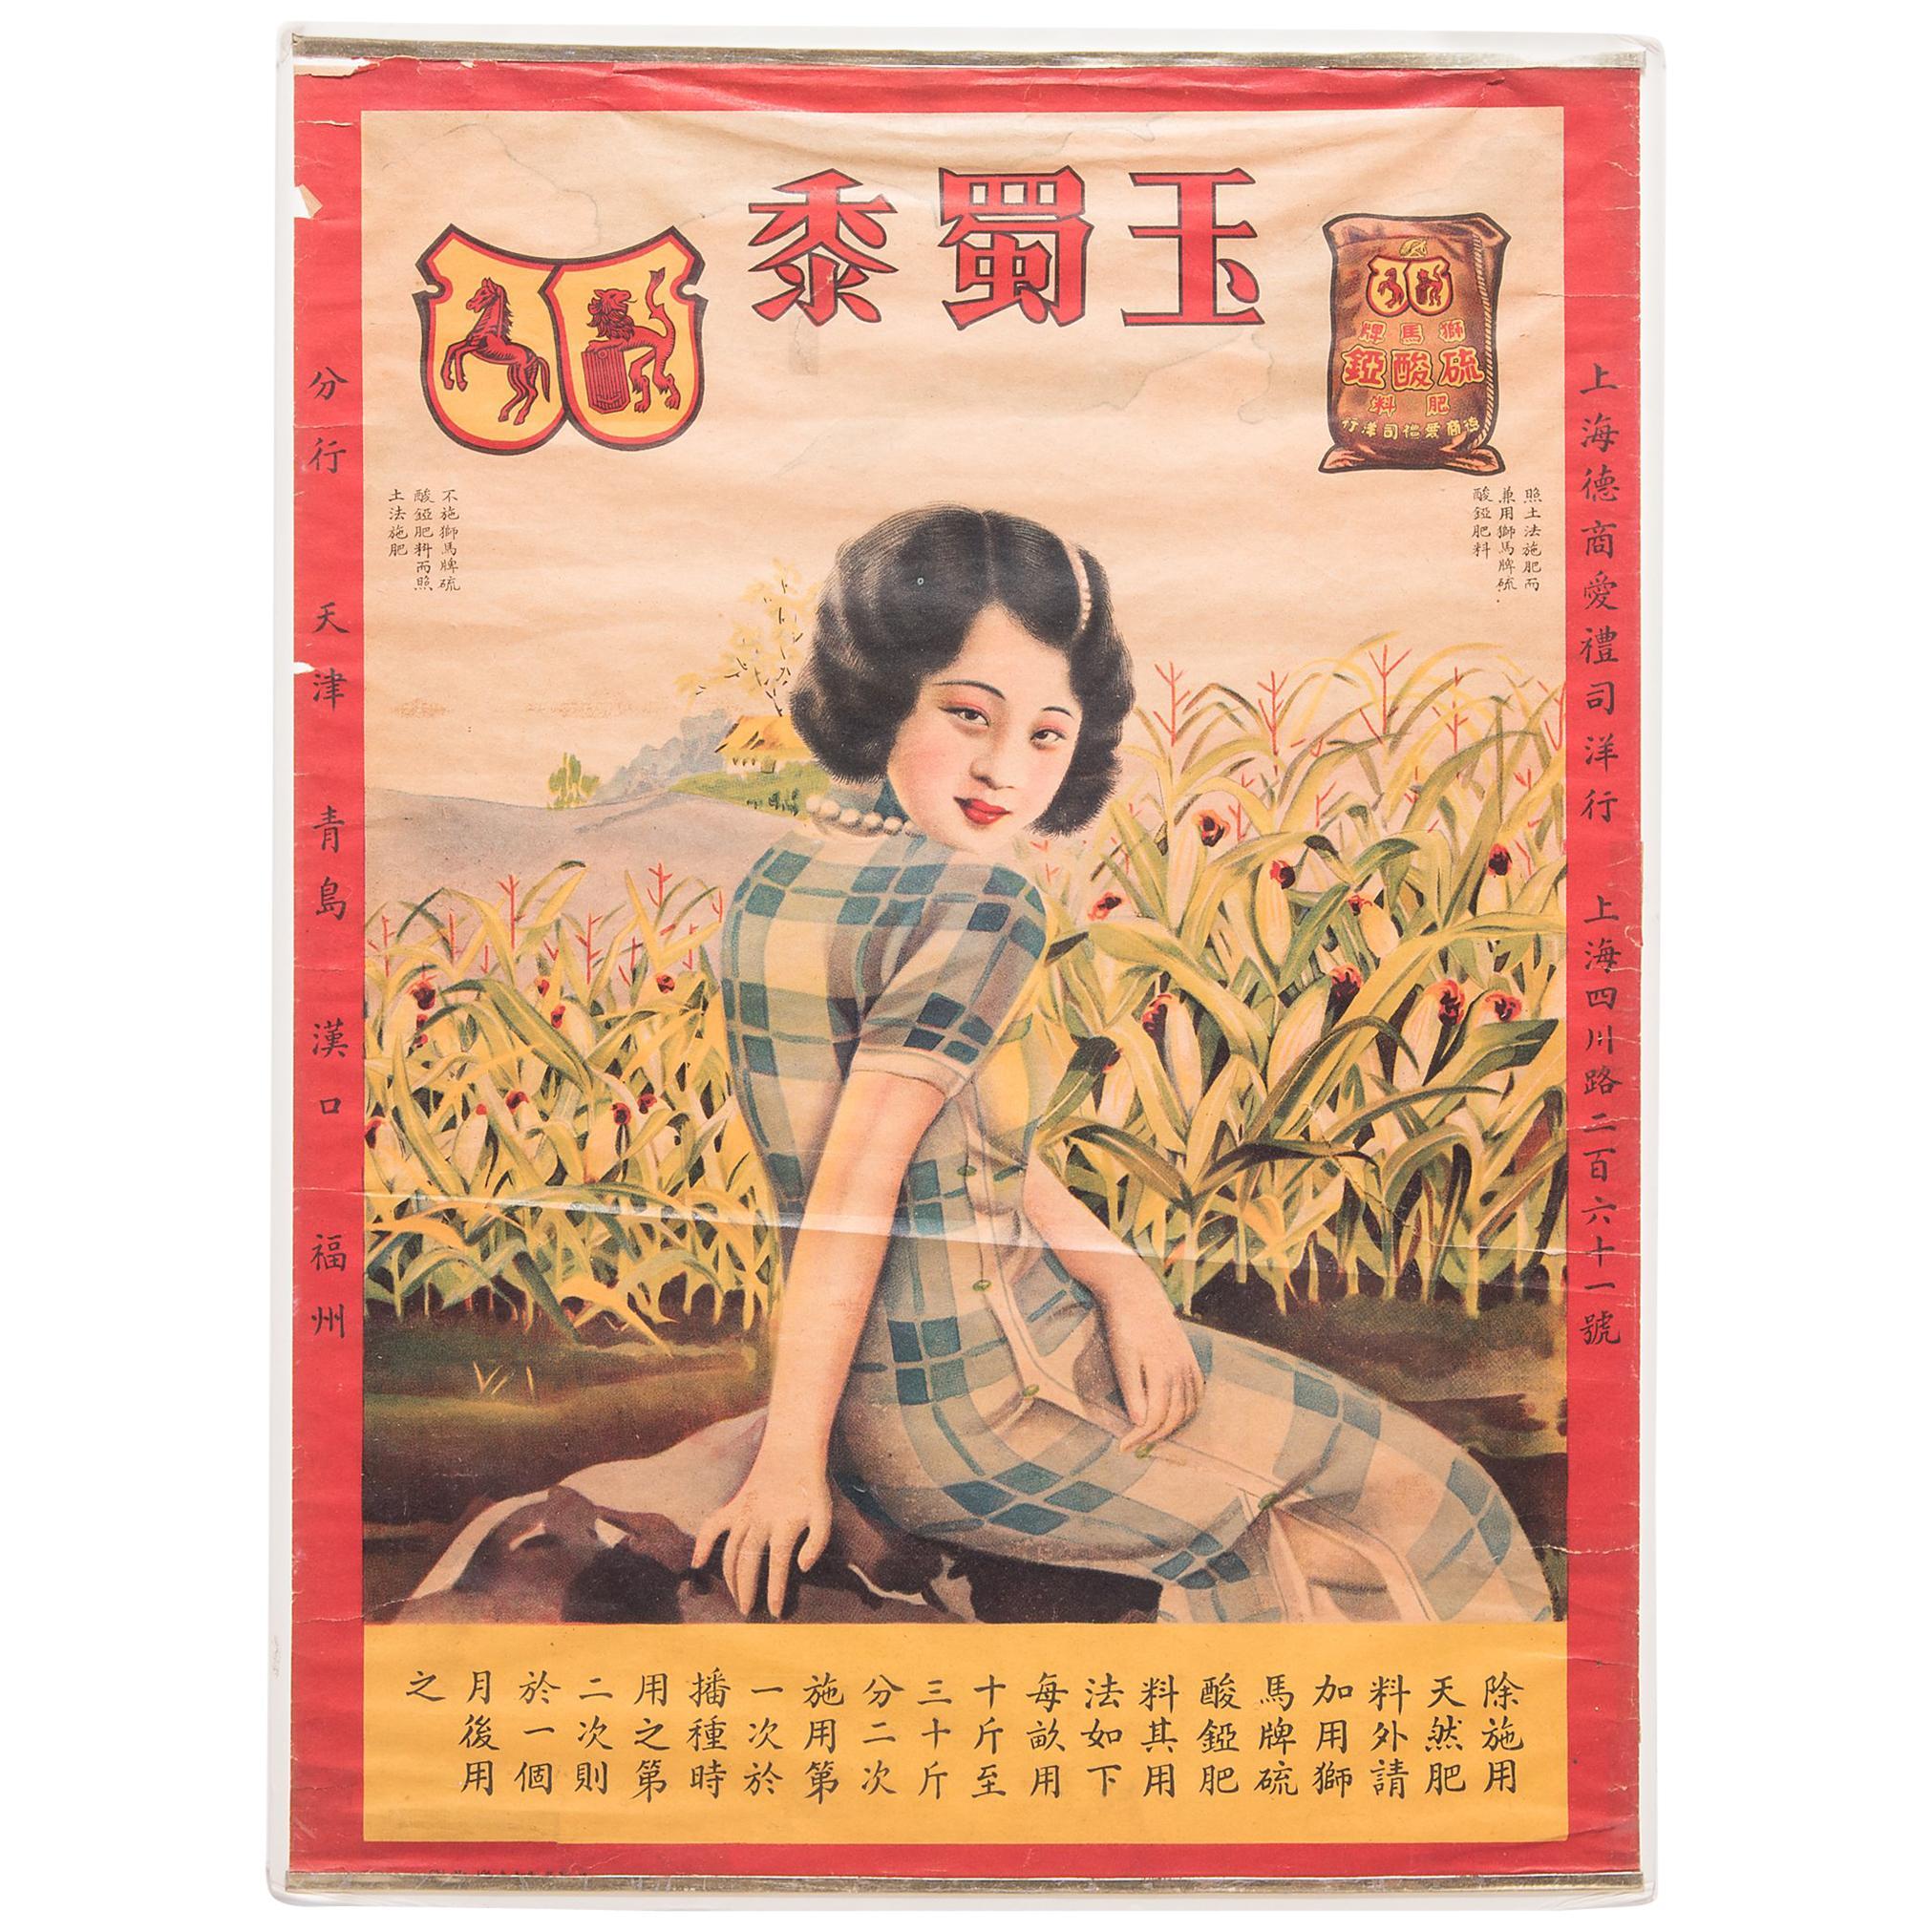 Vintage Chinese Fertilizer Advertisement Poster